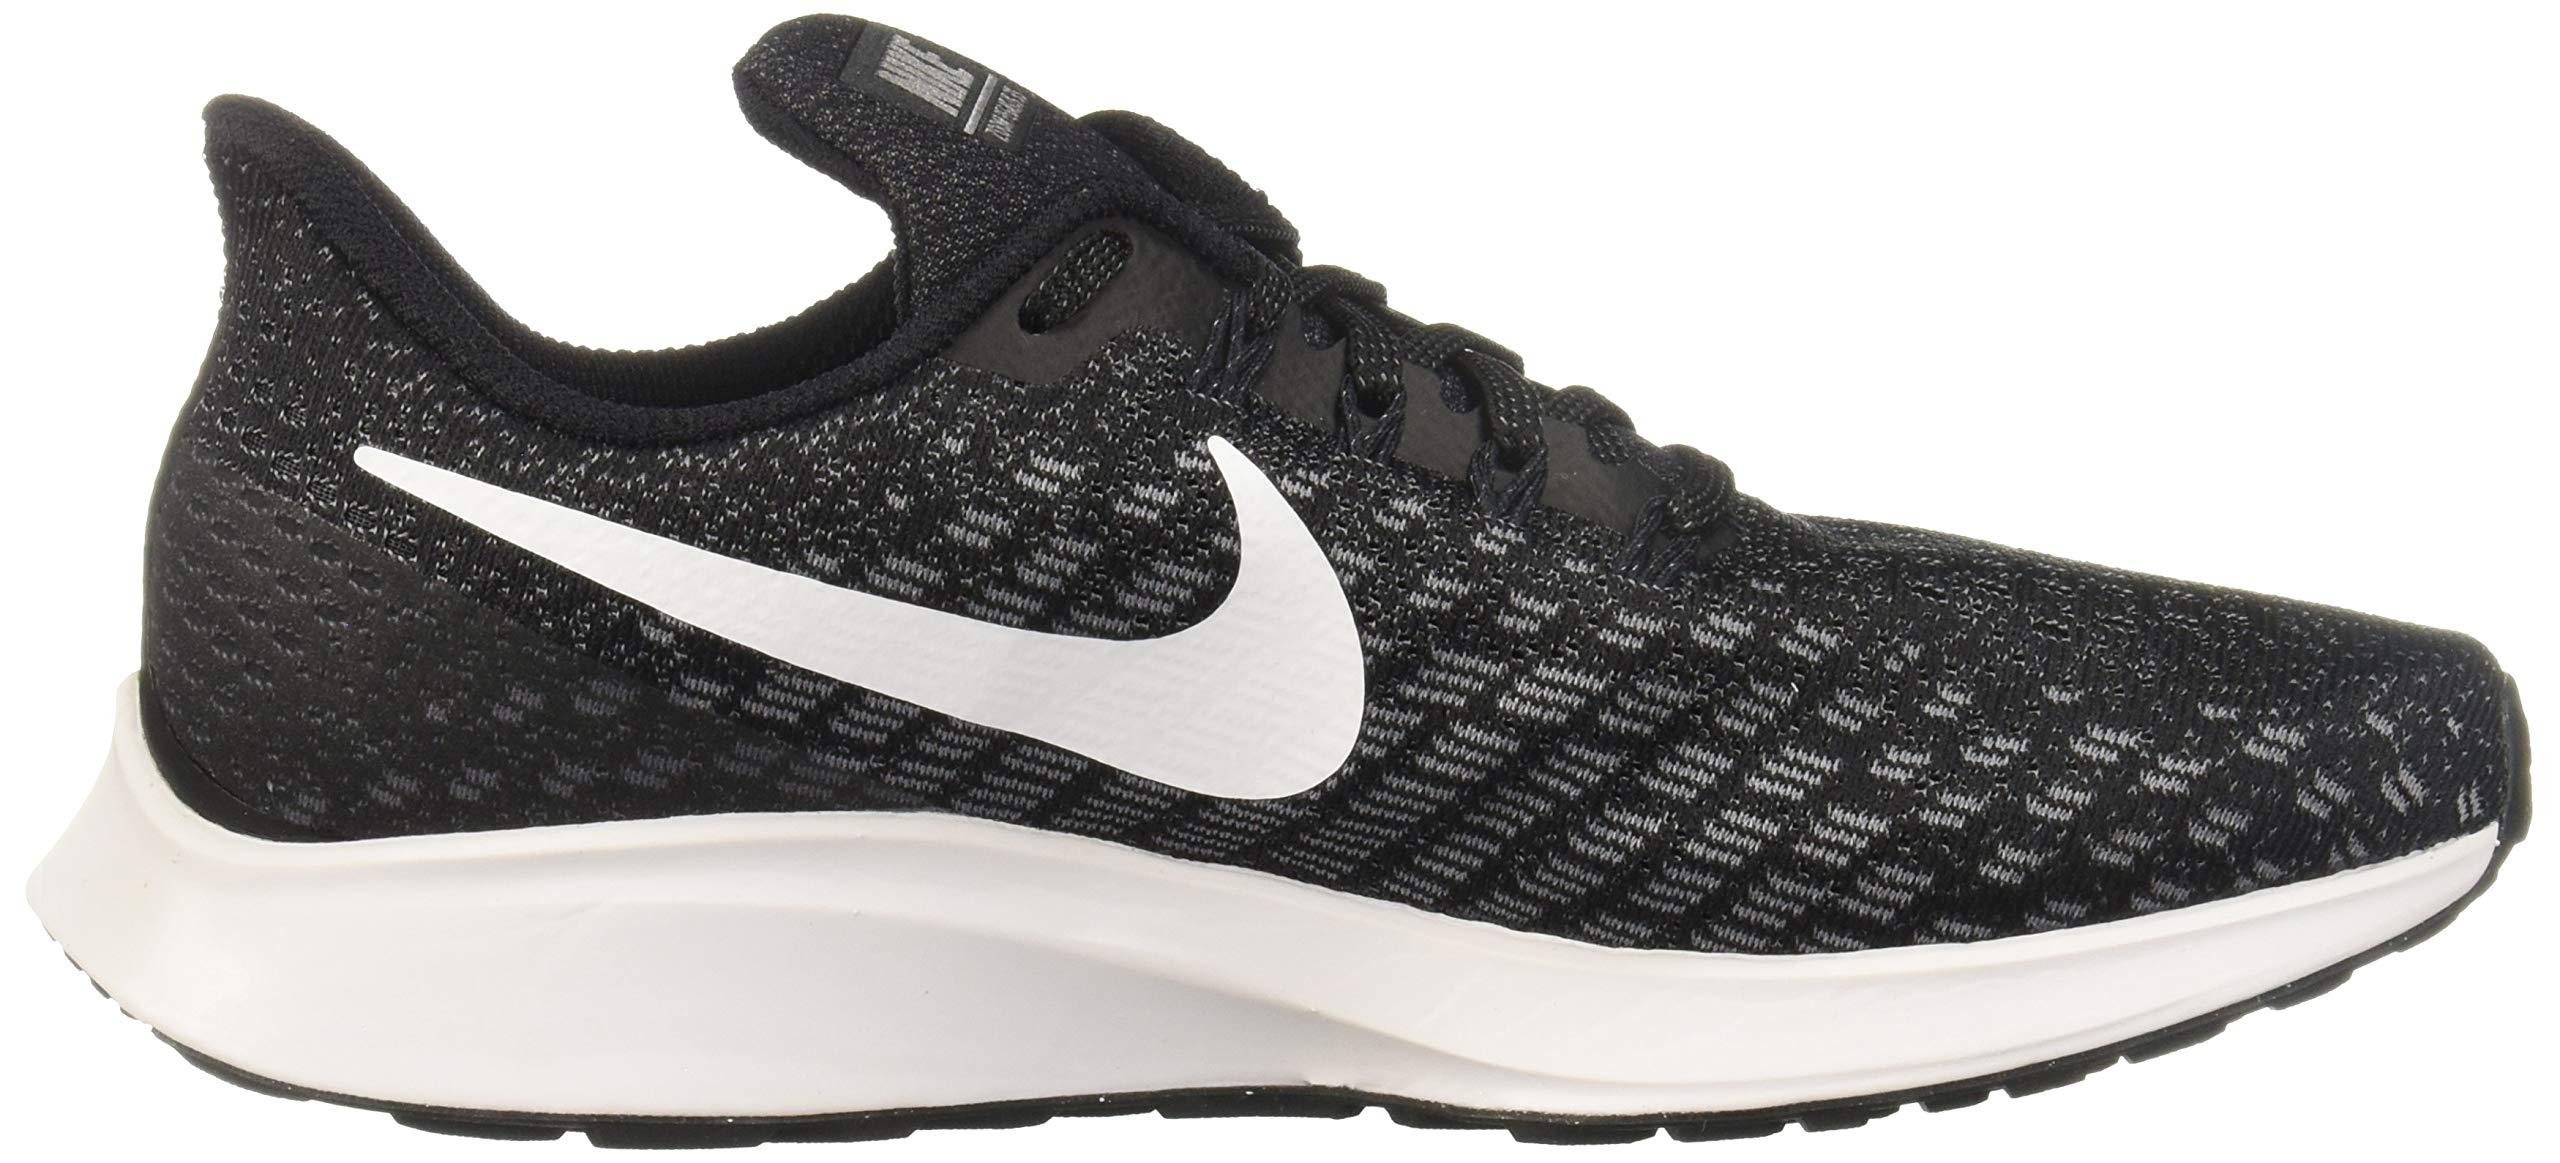 Nike Shox Current Gs Women's Running Shoe (5, Black/Black) by Nike (Image #6)